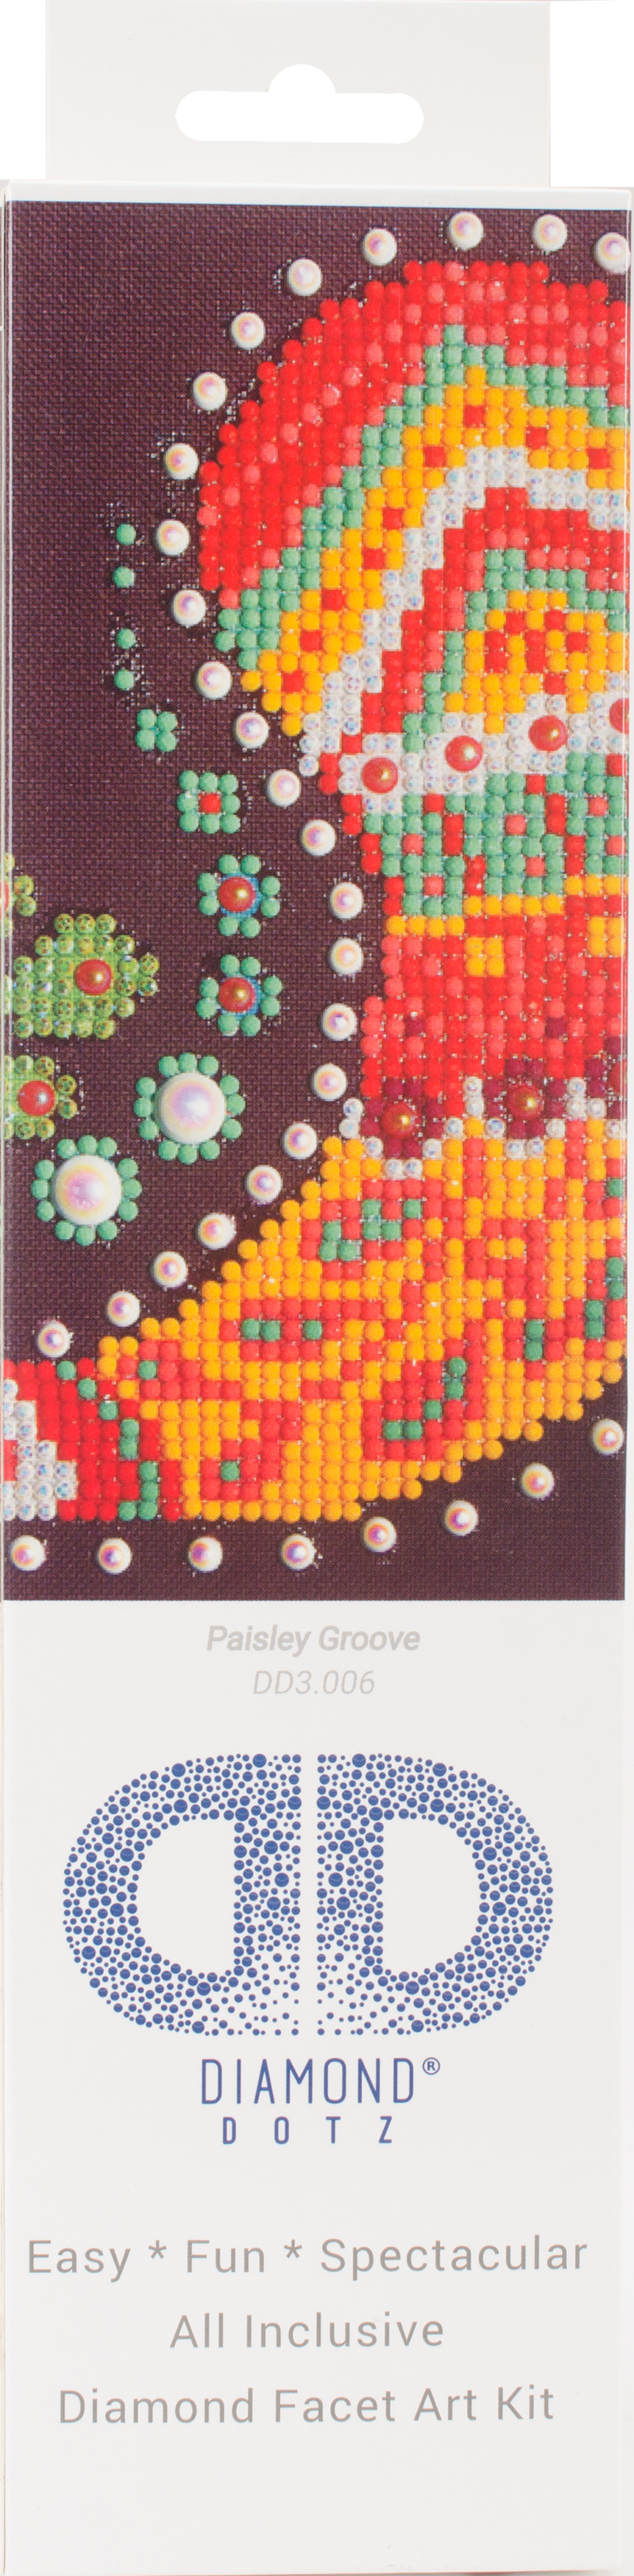 Diamond Dotz Diamond Embroidery Facet Art Kit 9.75X9.75-Paisley Groove